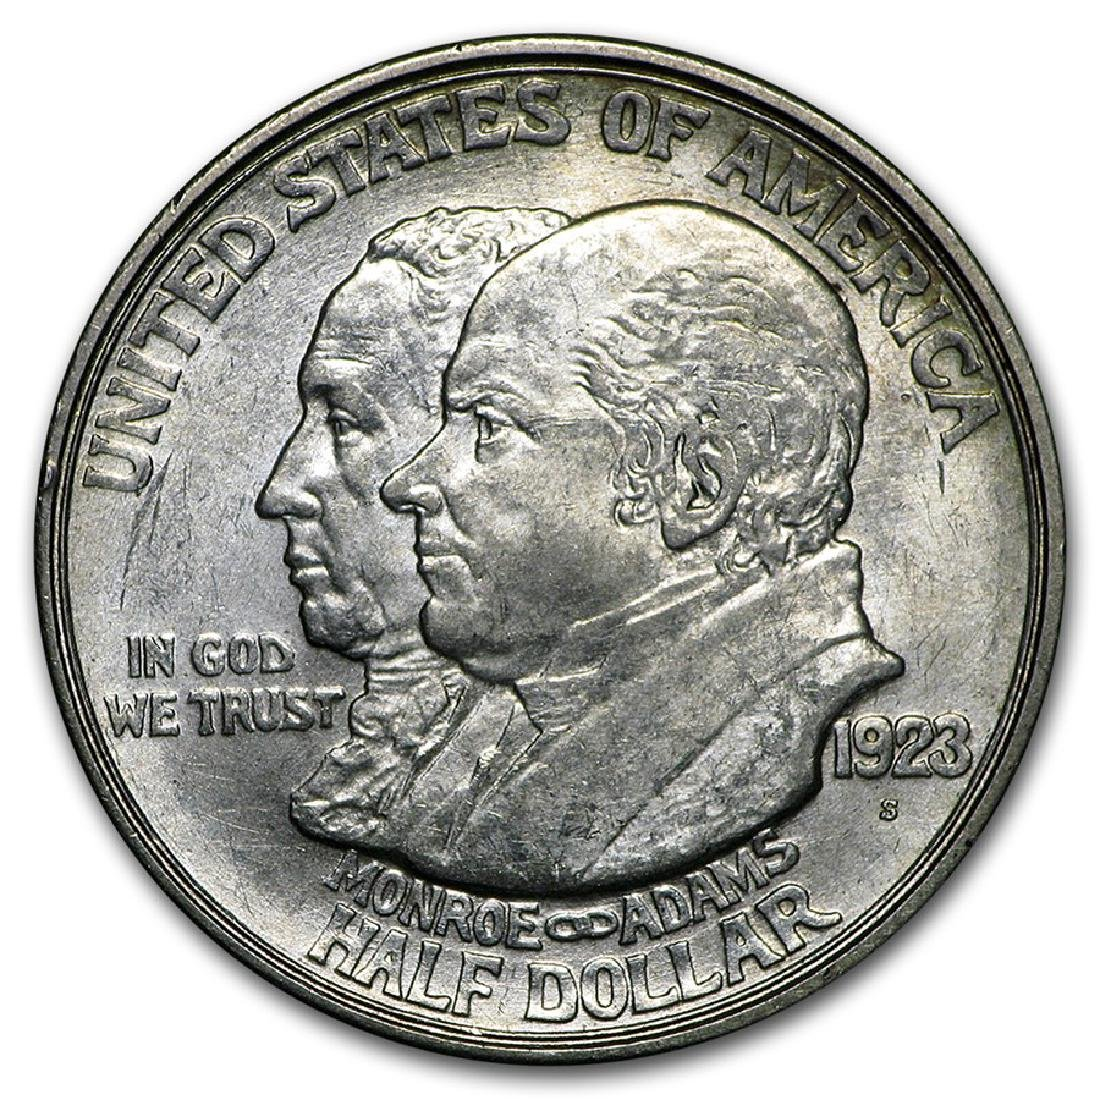 1923-S Monroe Doctrine Half Dollar Coin